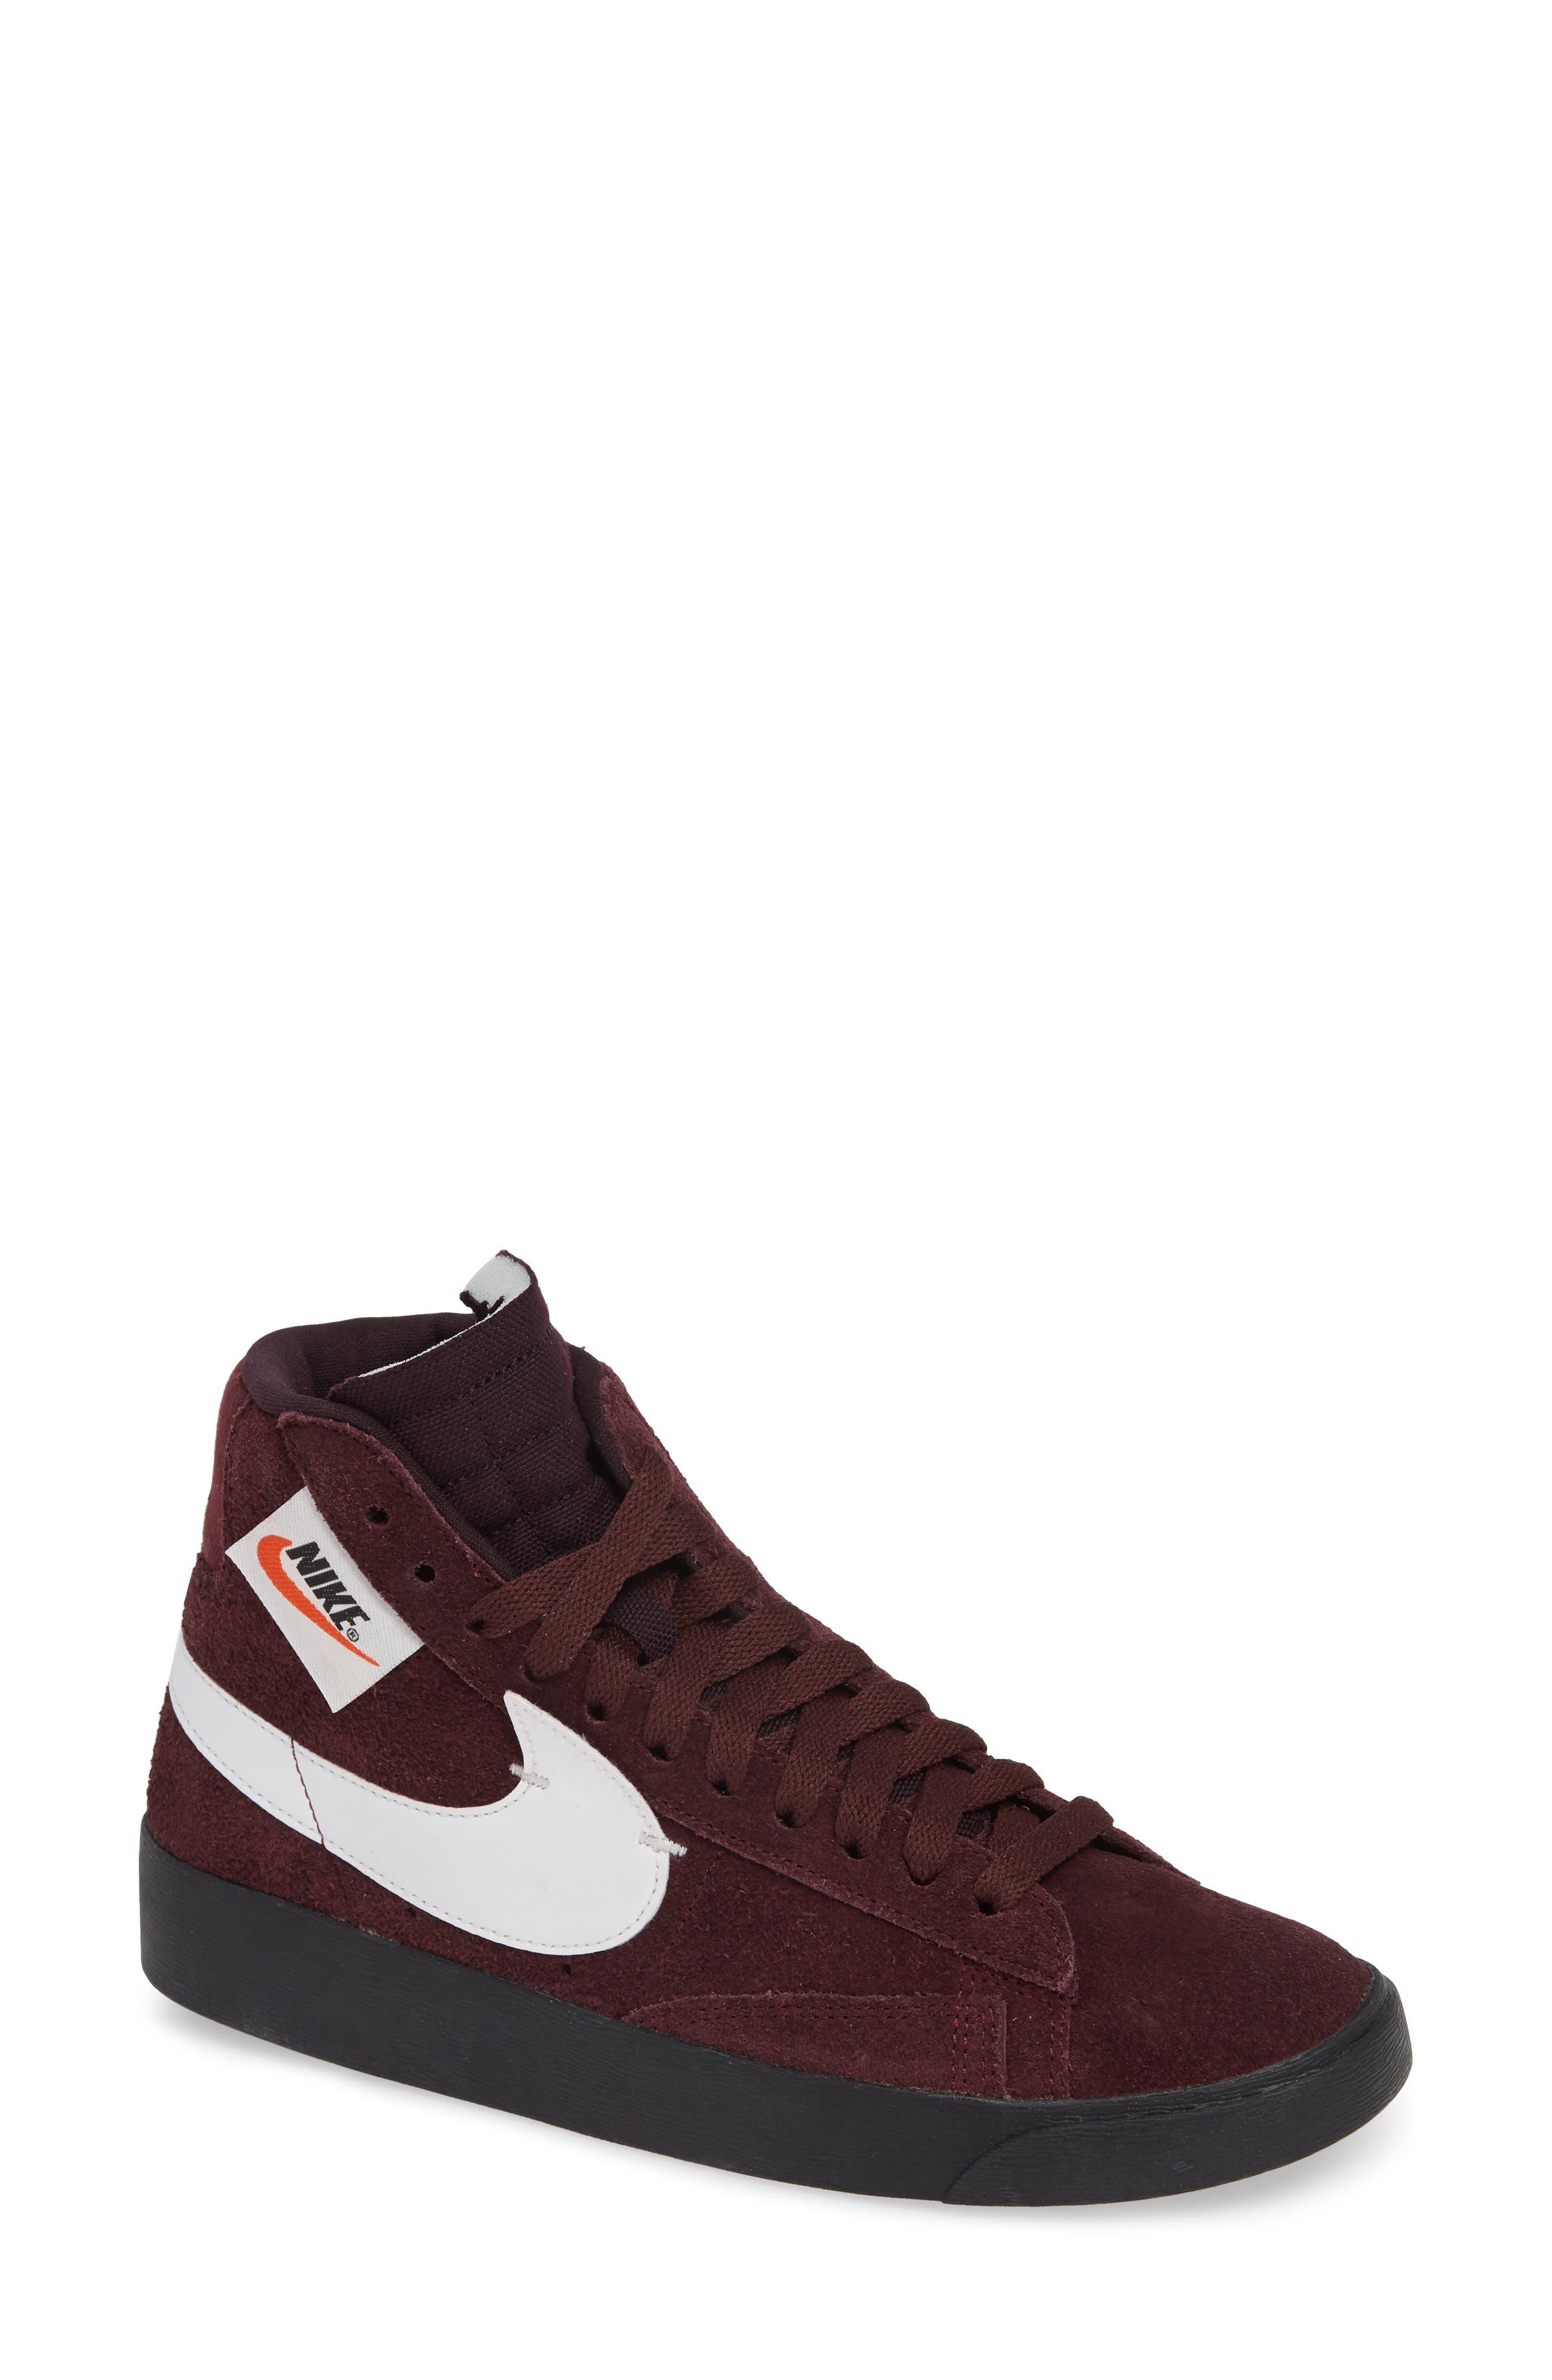 NIKE Blazer Mid Rebel Sneaker, Main, color, 930